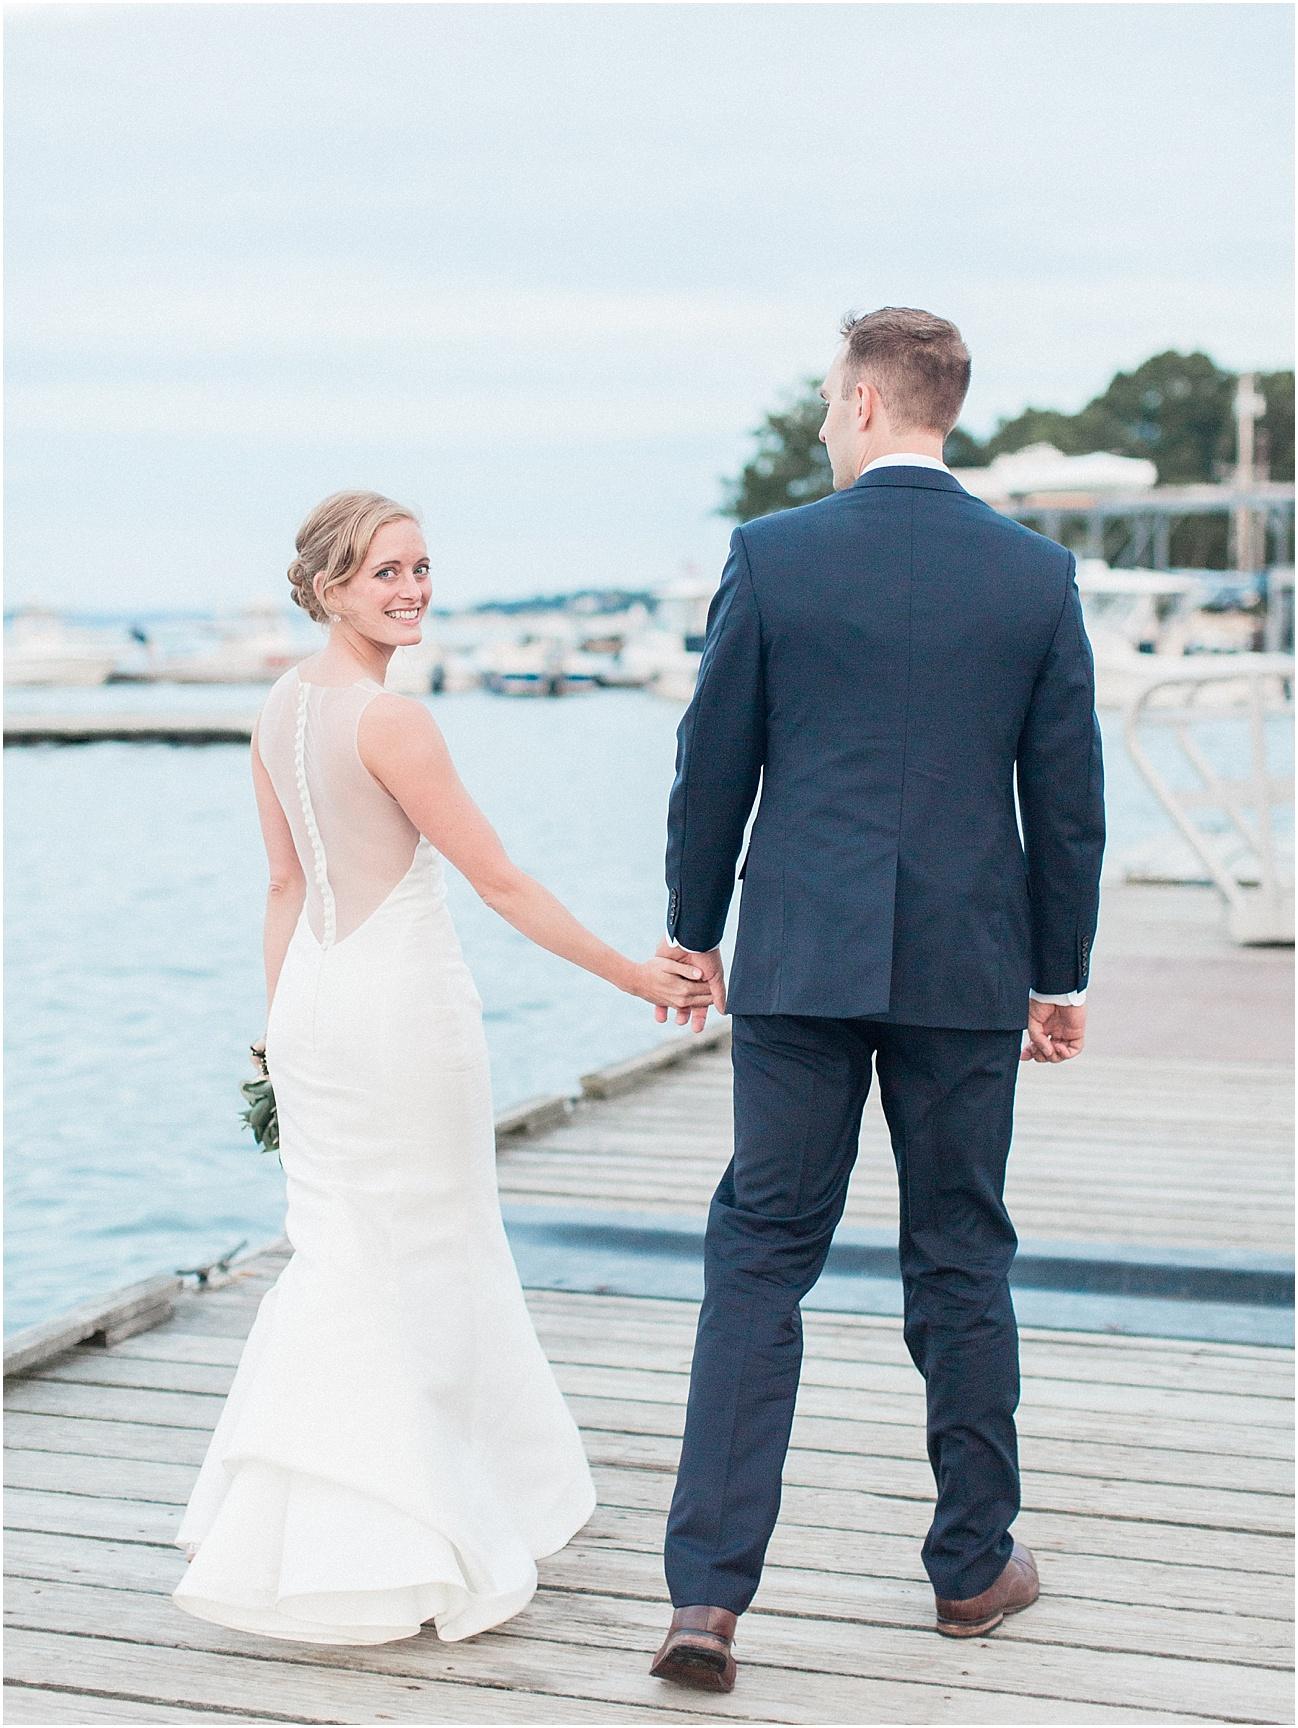 claire_gordon_duxbury_bay_maritime_school_beach_dock_powder_point_bridge_cape_cod_boston_wedding_photographer_meredith_jane_photography_photo_0609.jpg